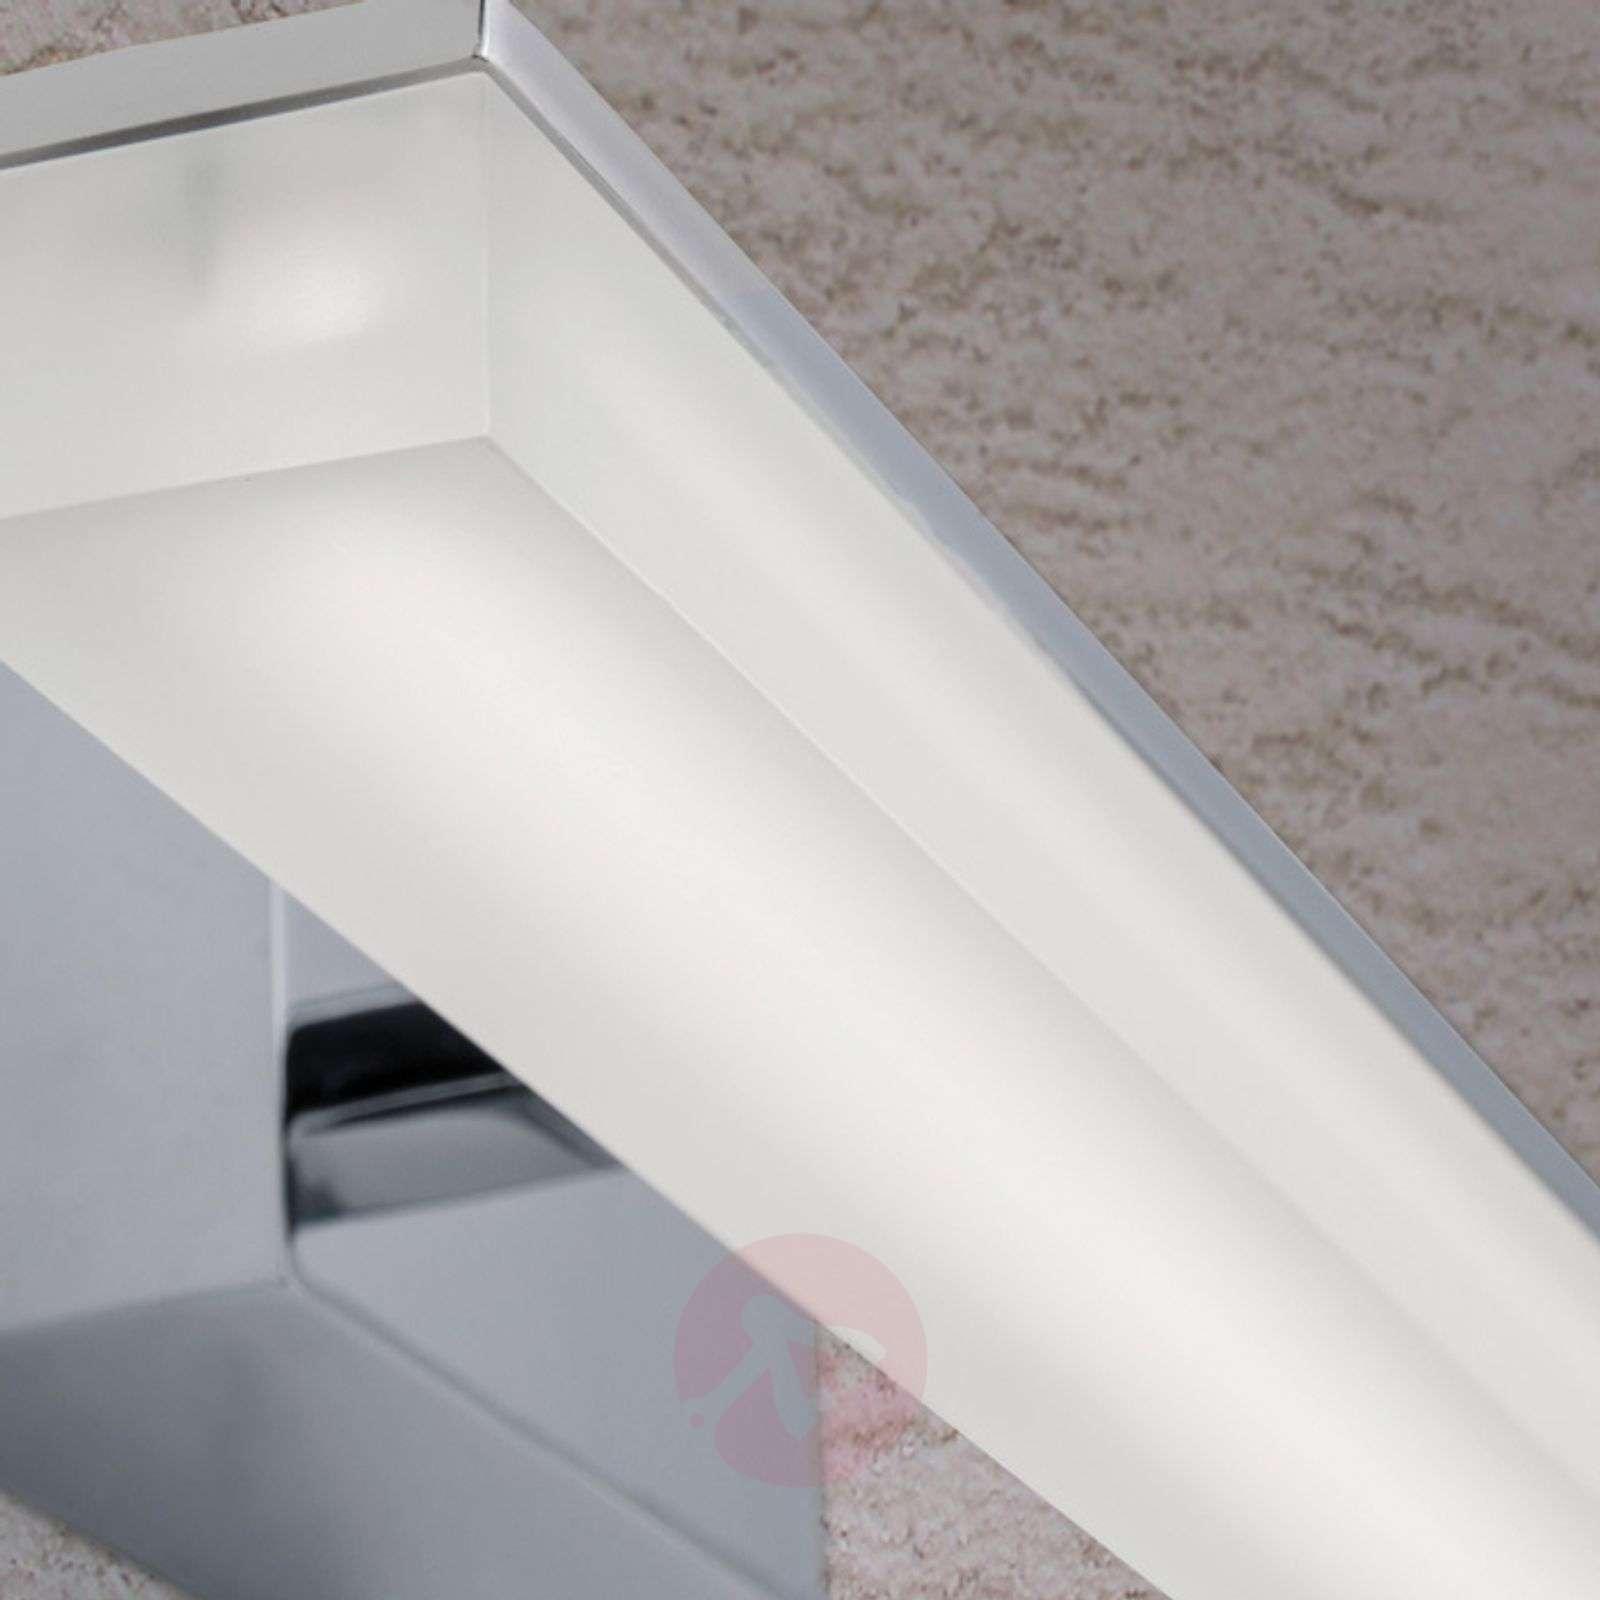 LED-seinävalaisin Alexander, IP44-7254677X-01